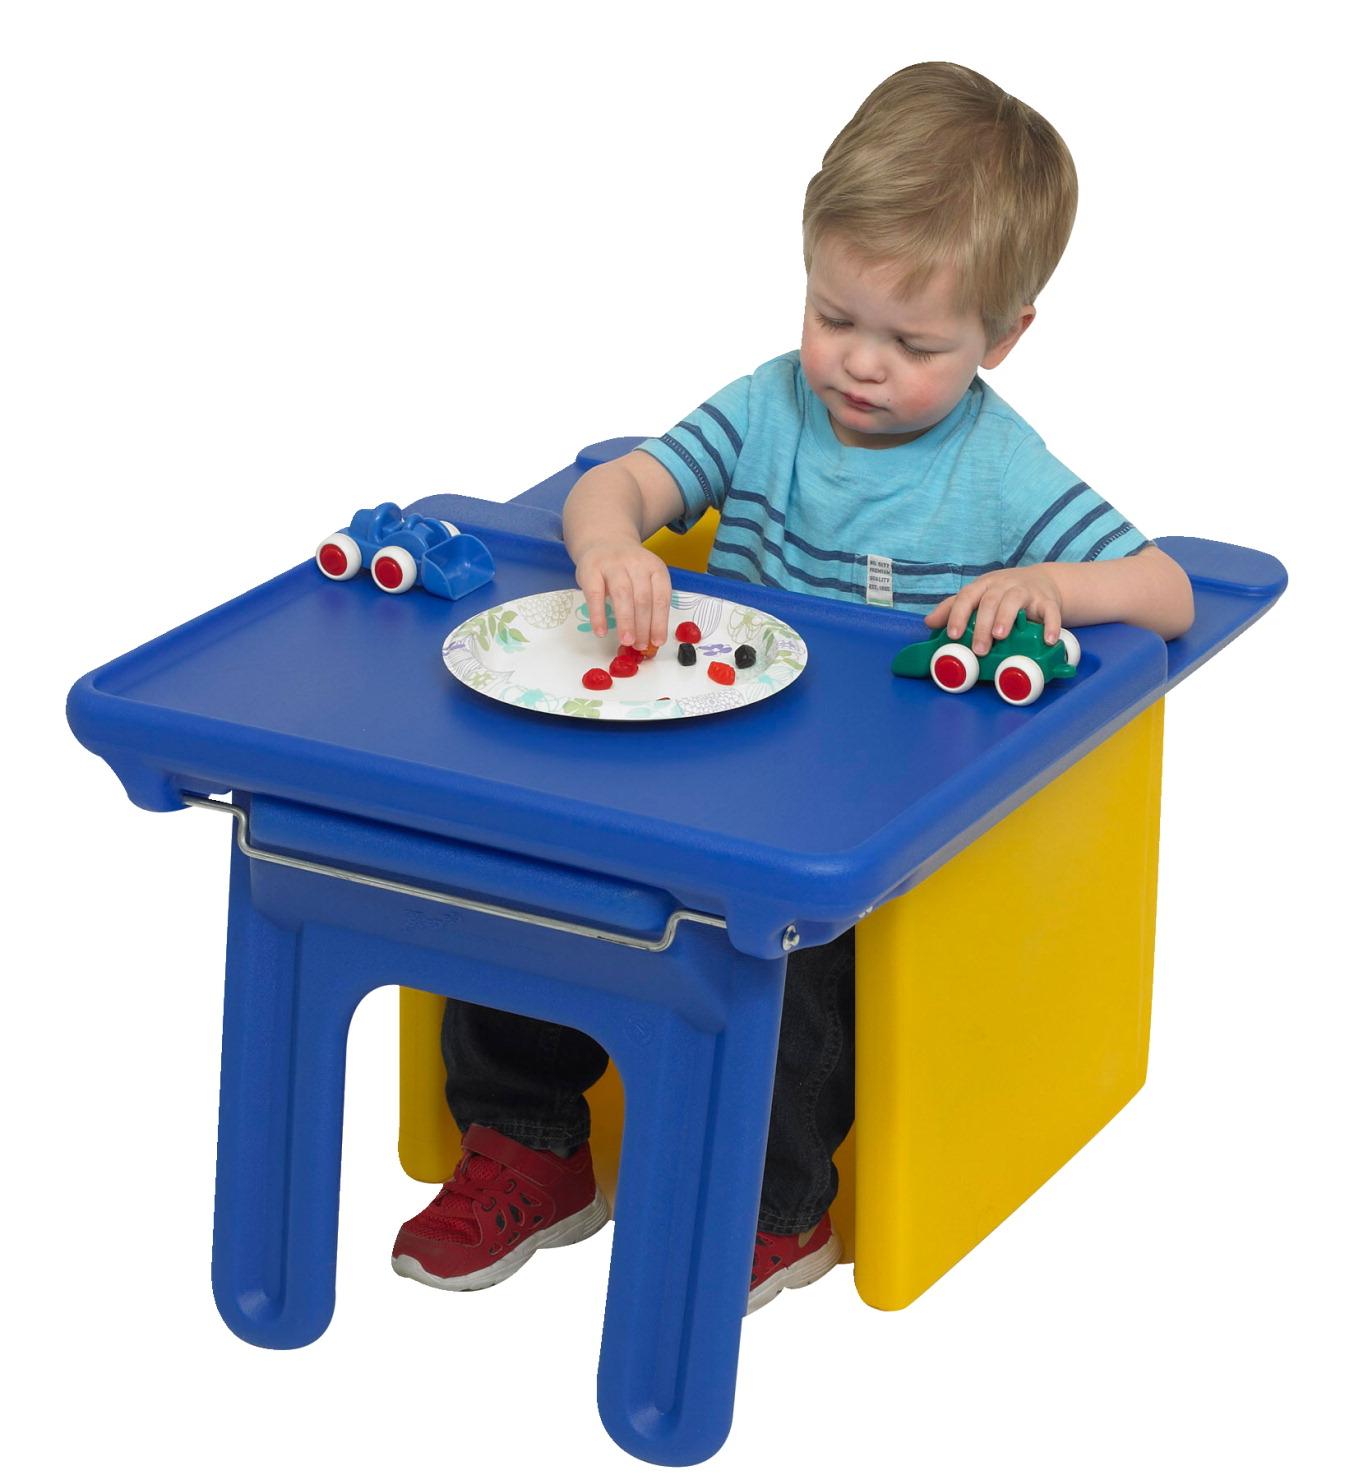 Activity Seat - SCHOOL SPECIALTY MARKETPLACE